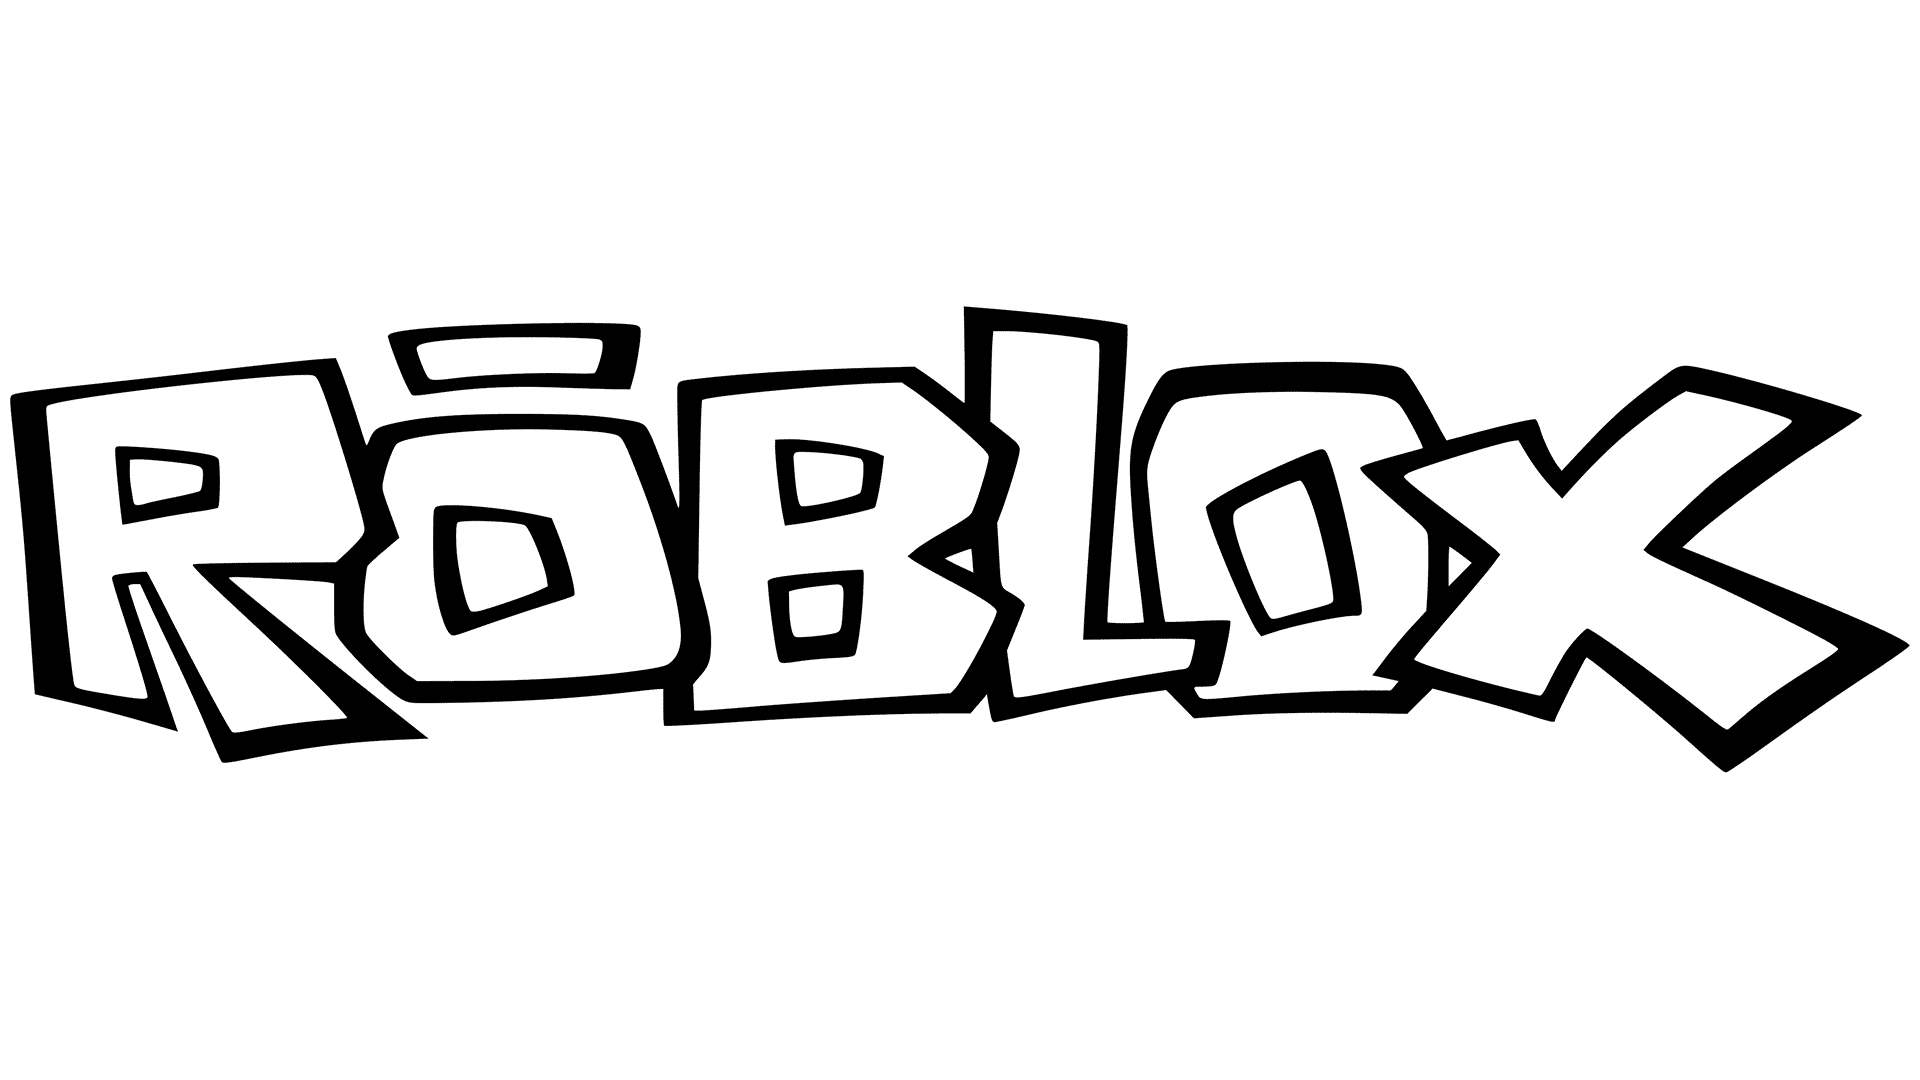 Roblox Logo Coloring Page